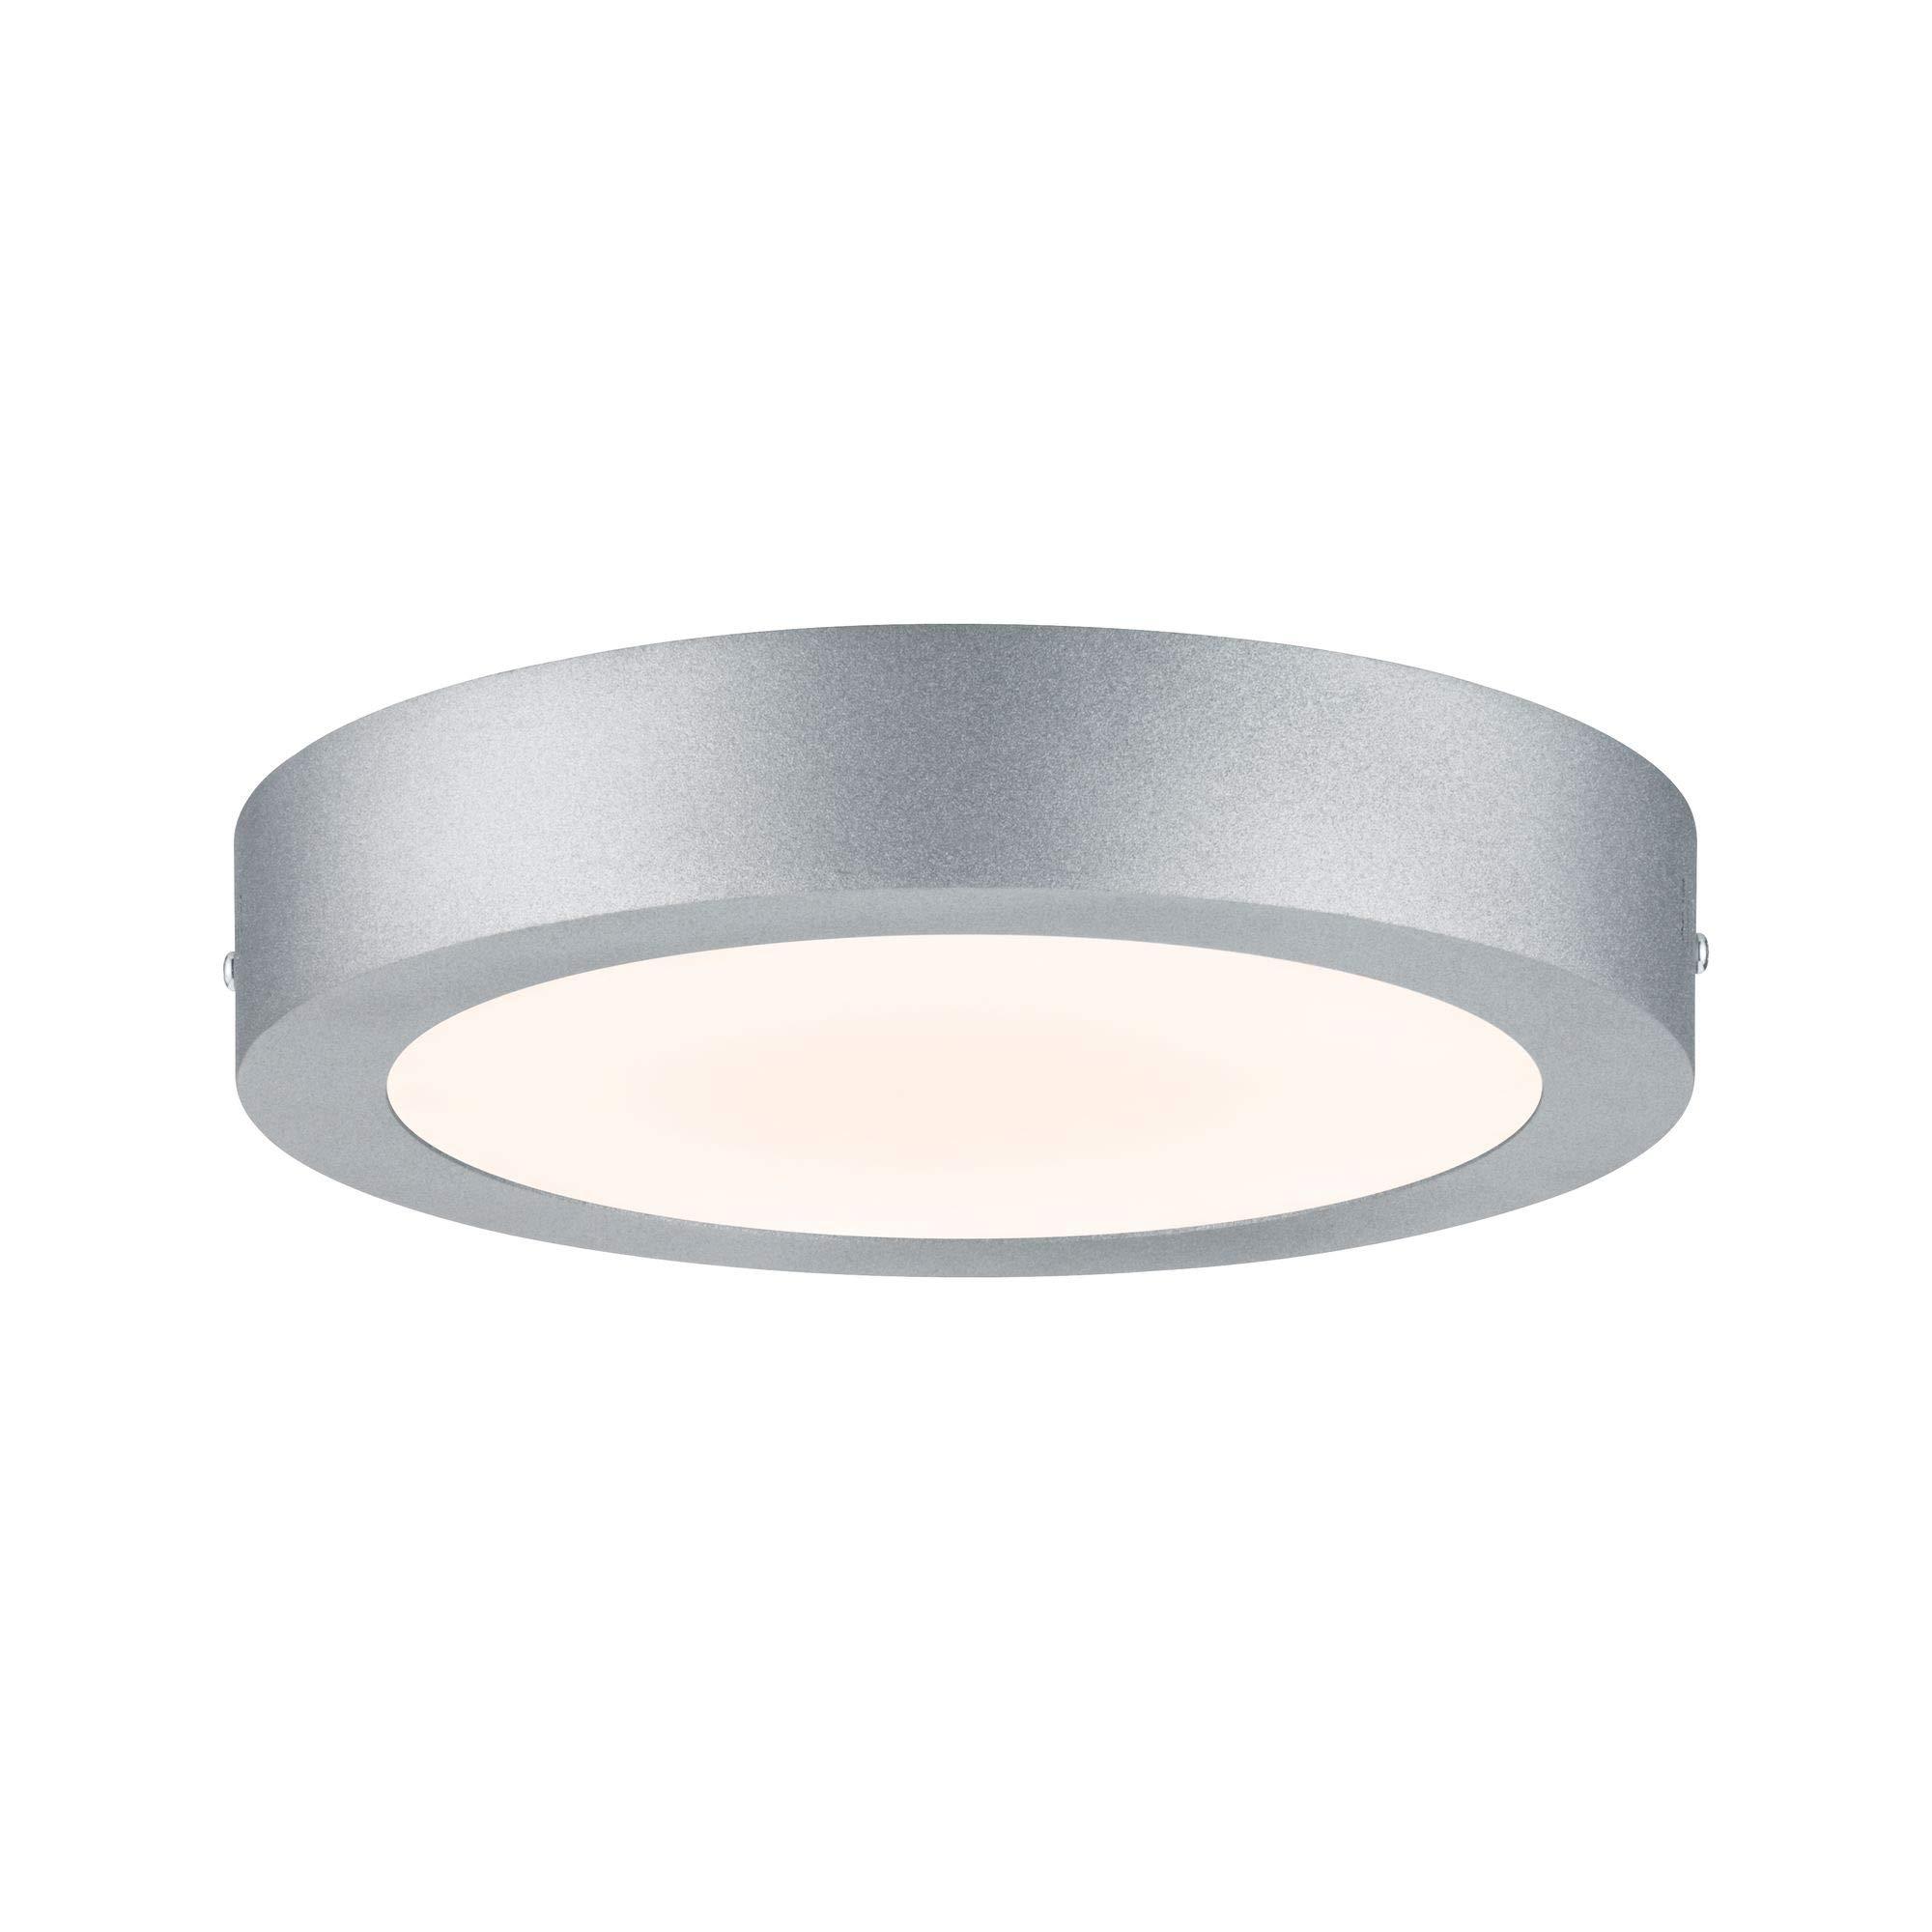 Paulmann Berman 706.54ウォールシーリングルナLEDパネル225 mm 15 W 230 Vクロムマットアルミ70654天井灯